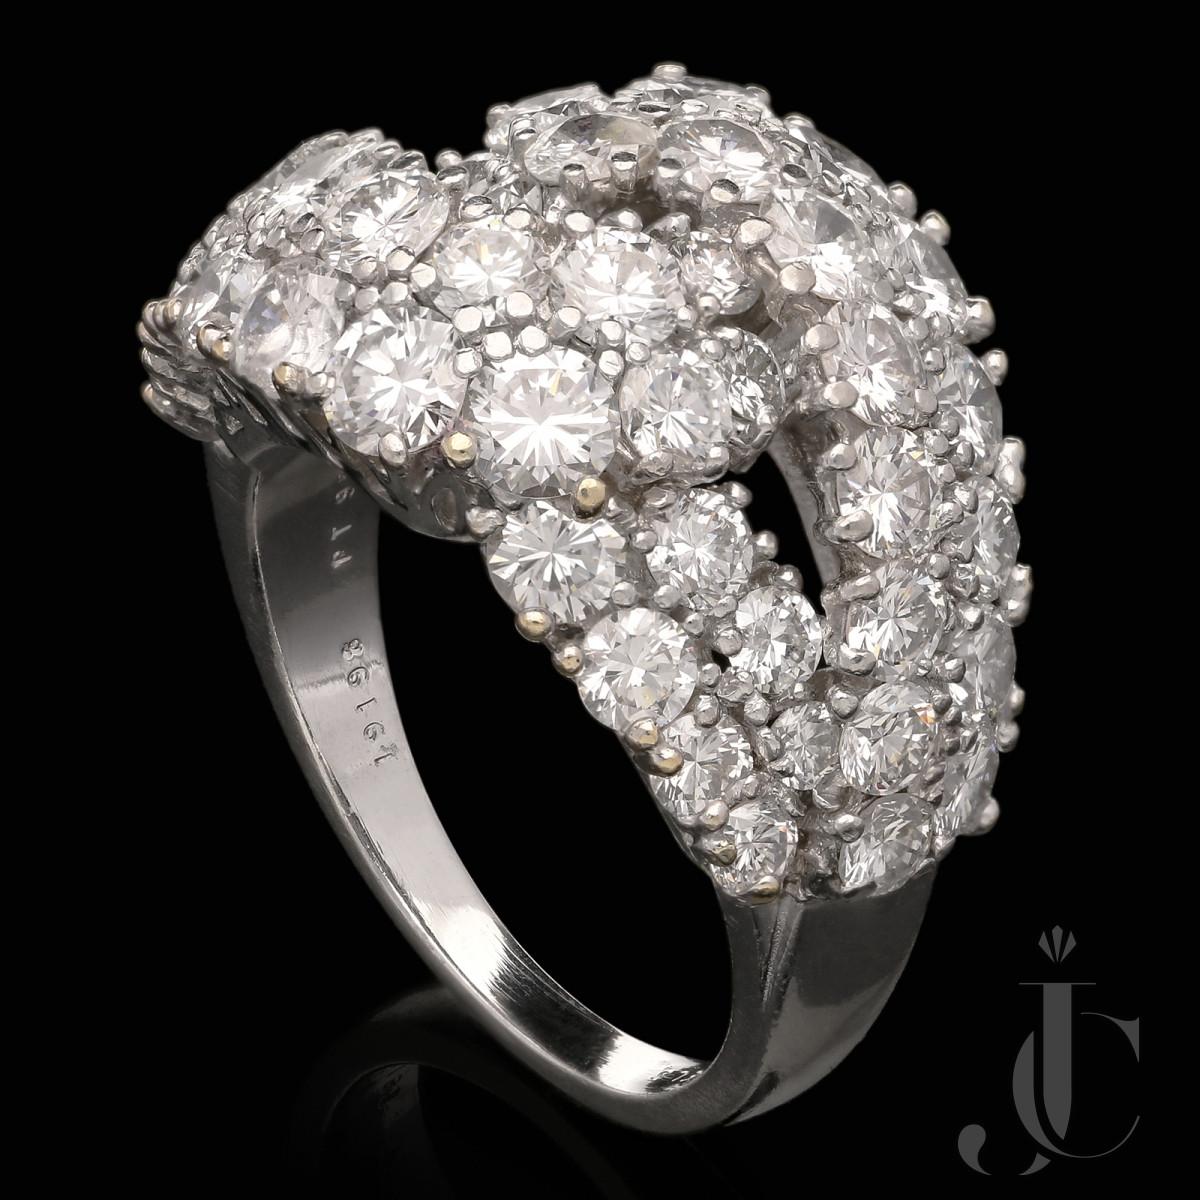 Van Cleef & Arpels - Diamond